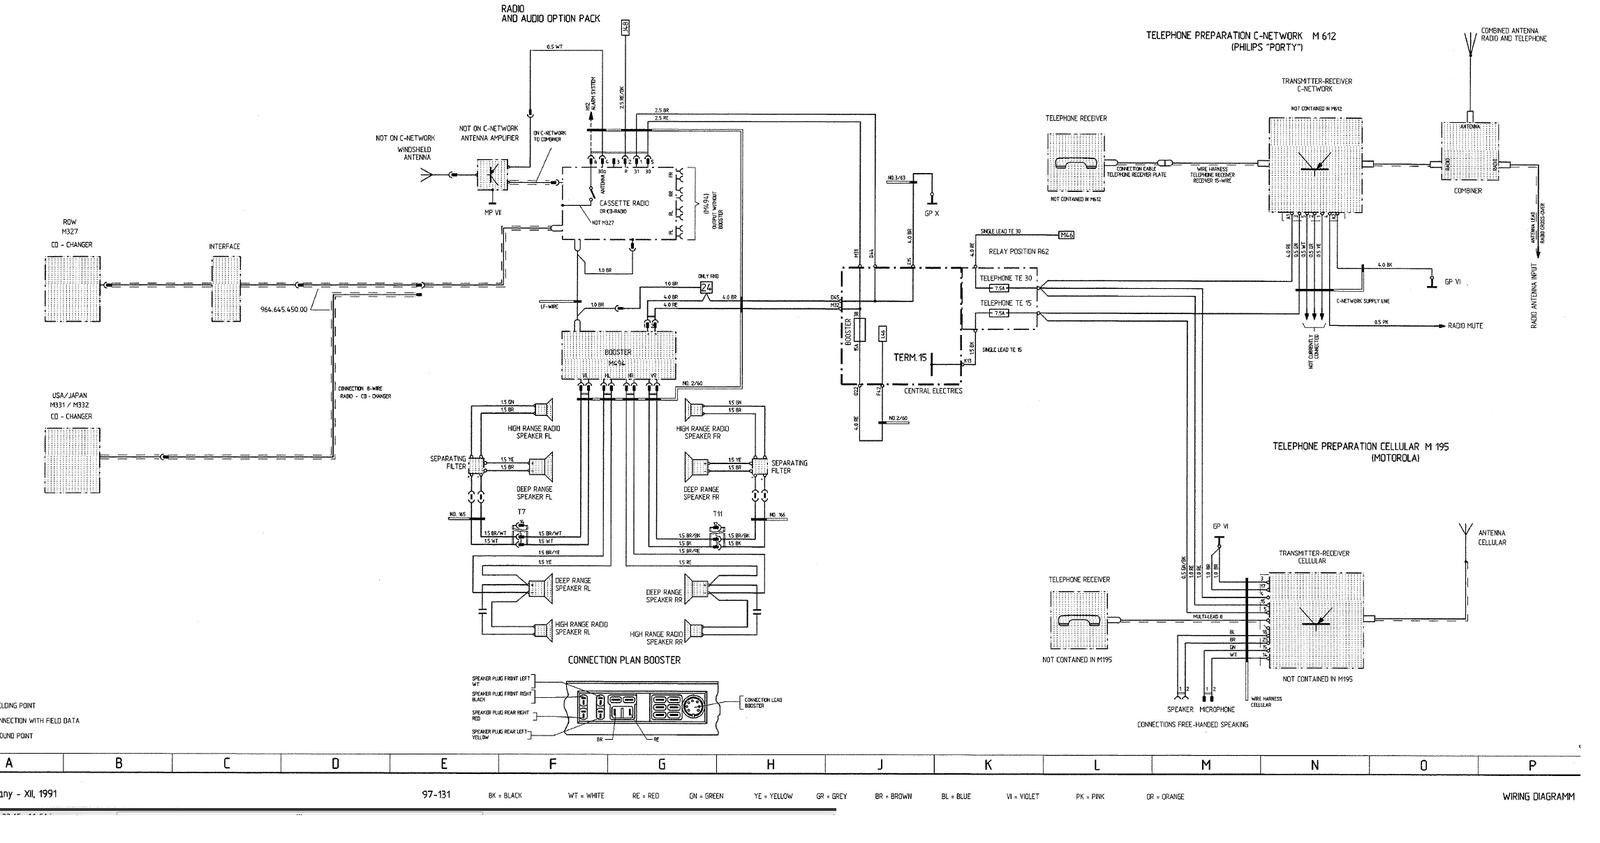 Wiring Diagram 1930 Snorkle Scissor Lift In 2020 Wire Scissor Lift Electrical Wiring Diagram